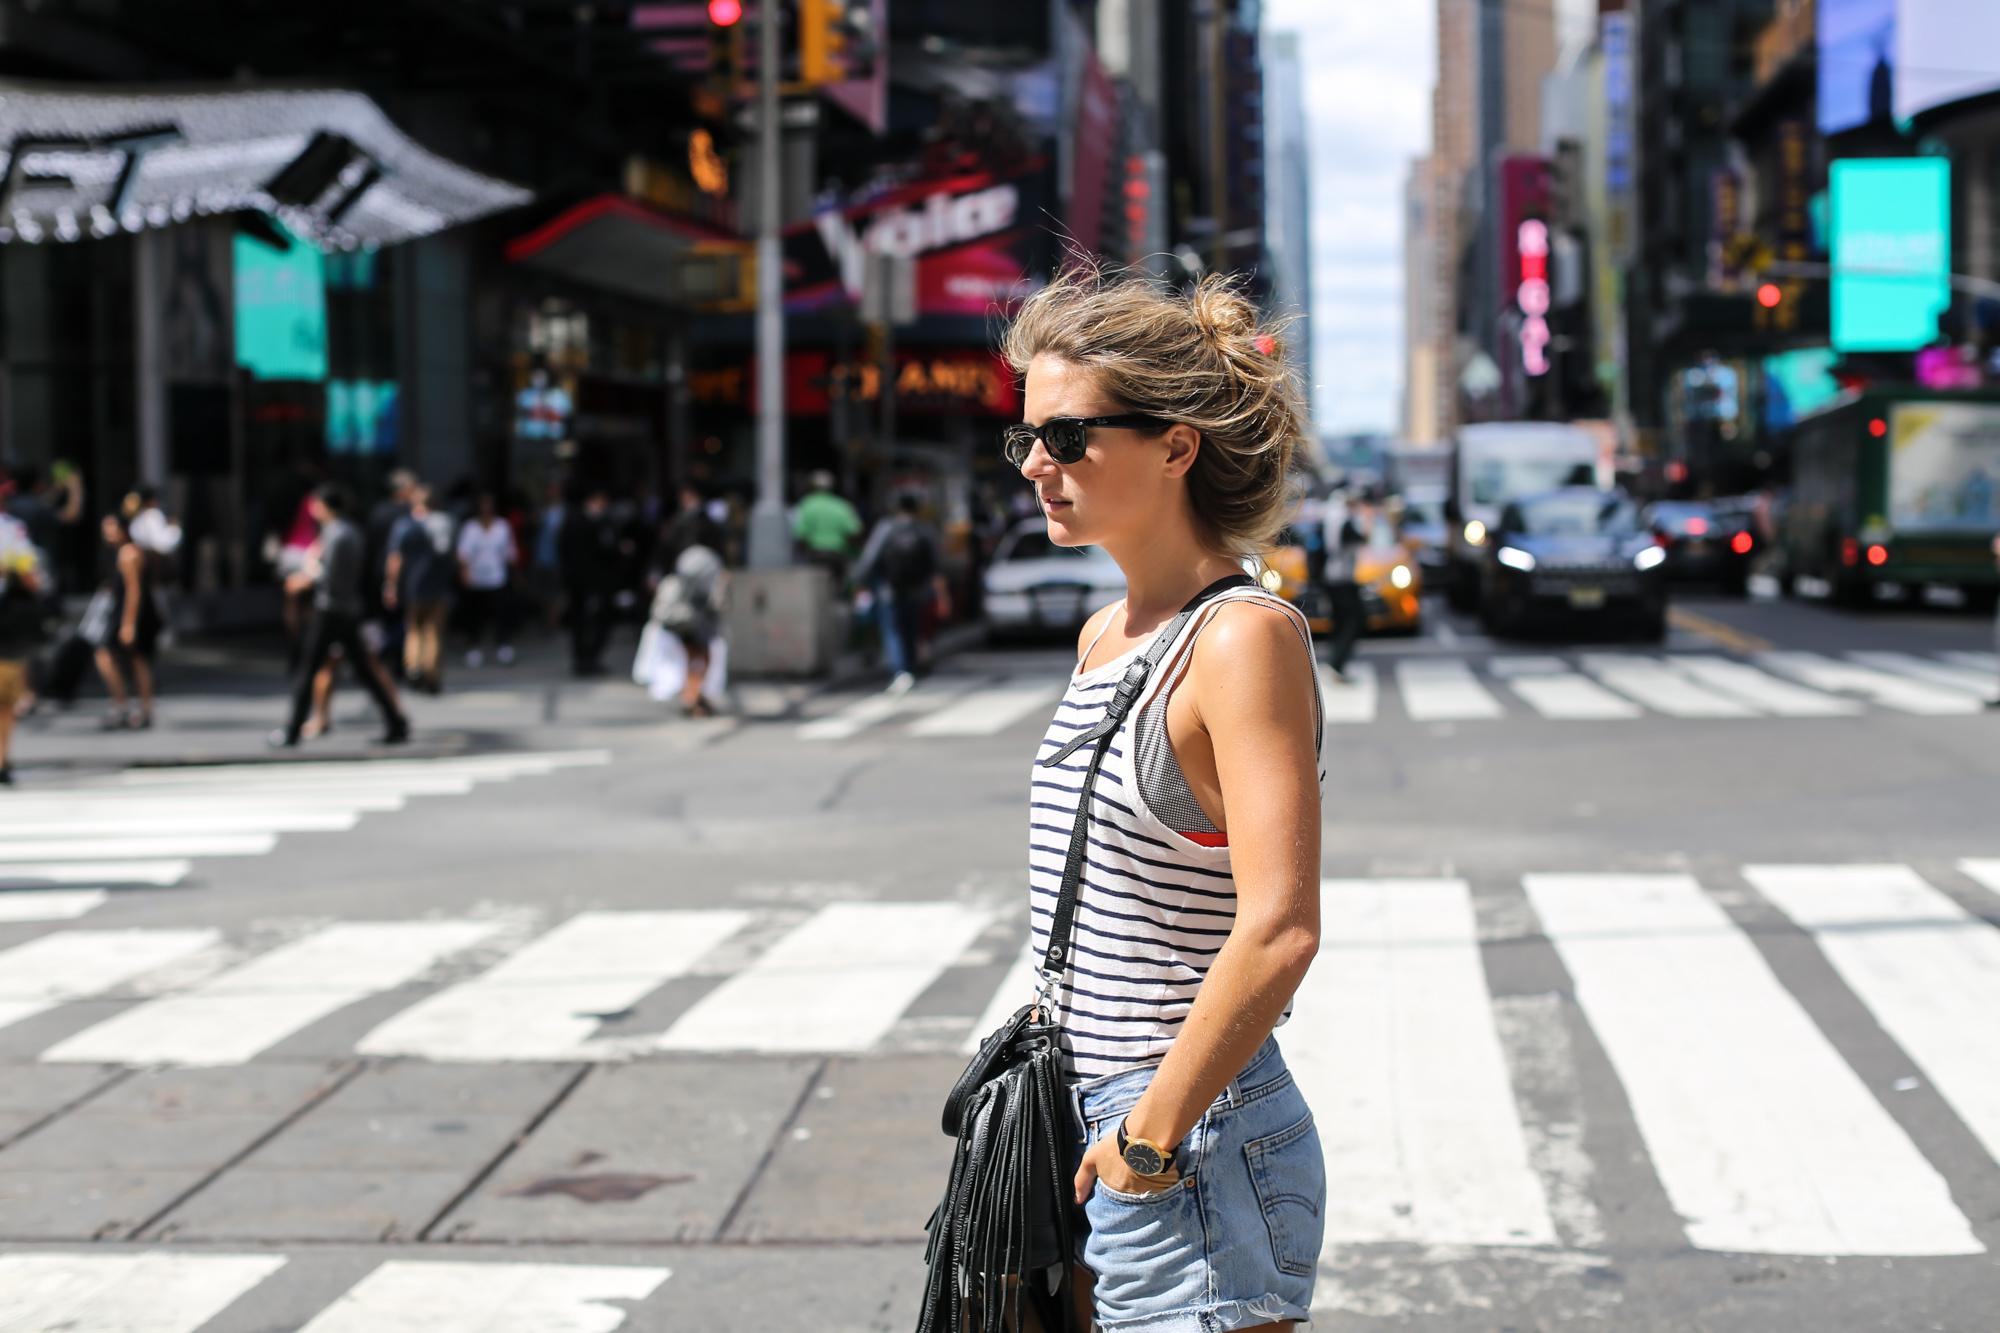 Clochet_Streetstyle_newyork_levis501_vintage_larssonjennings_saxon_watch-15